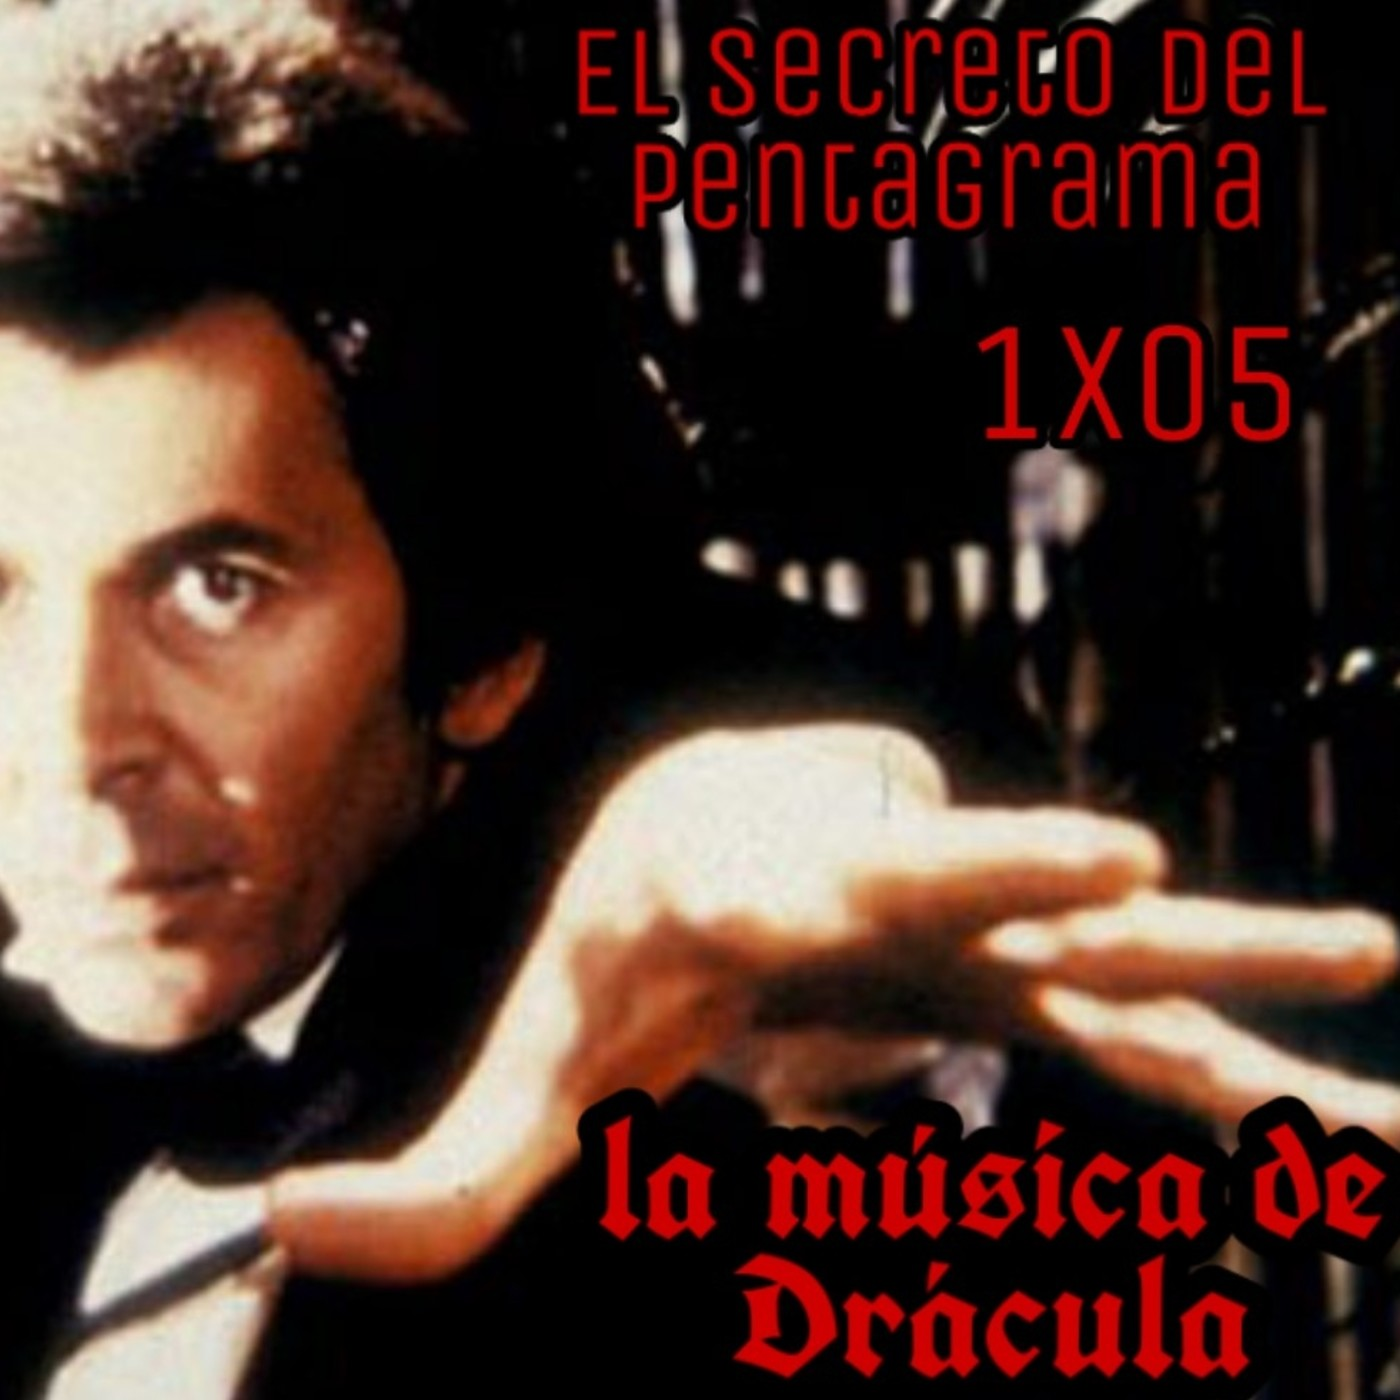 EL SECRETO DEL PENTAGRAMA 1X05 La música de Drácula